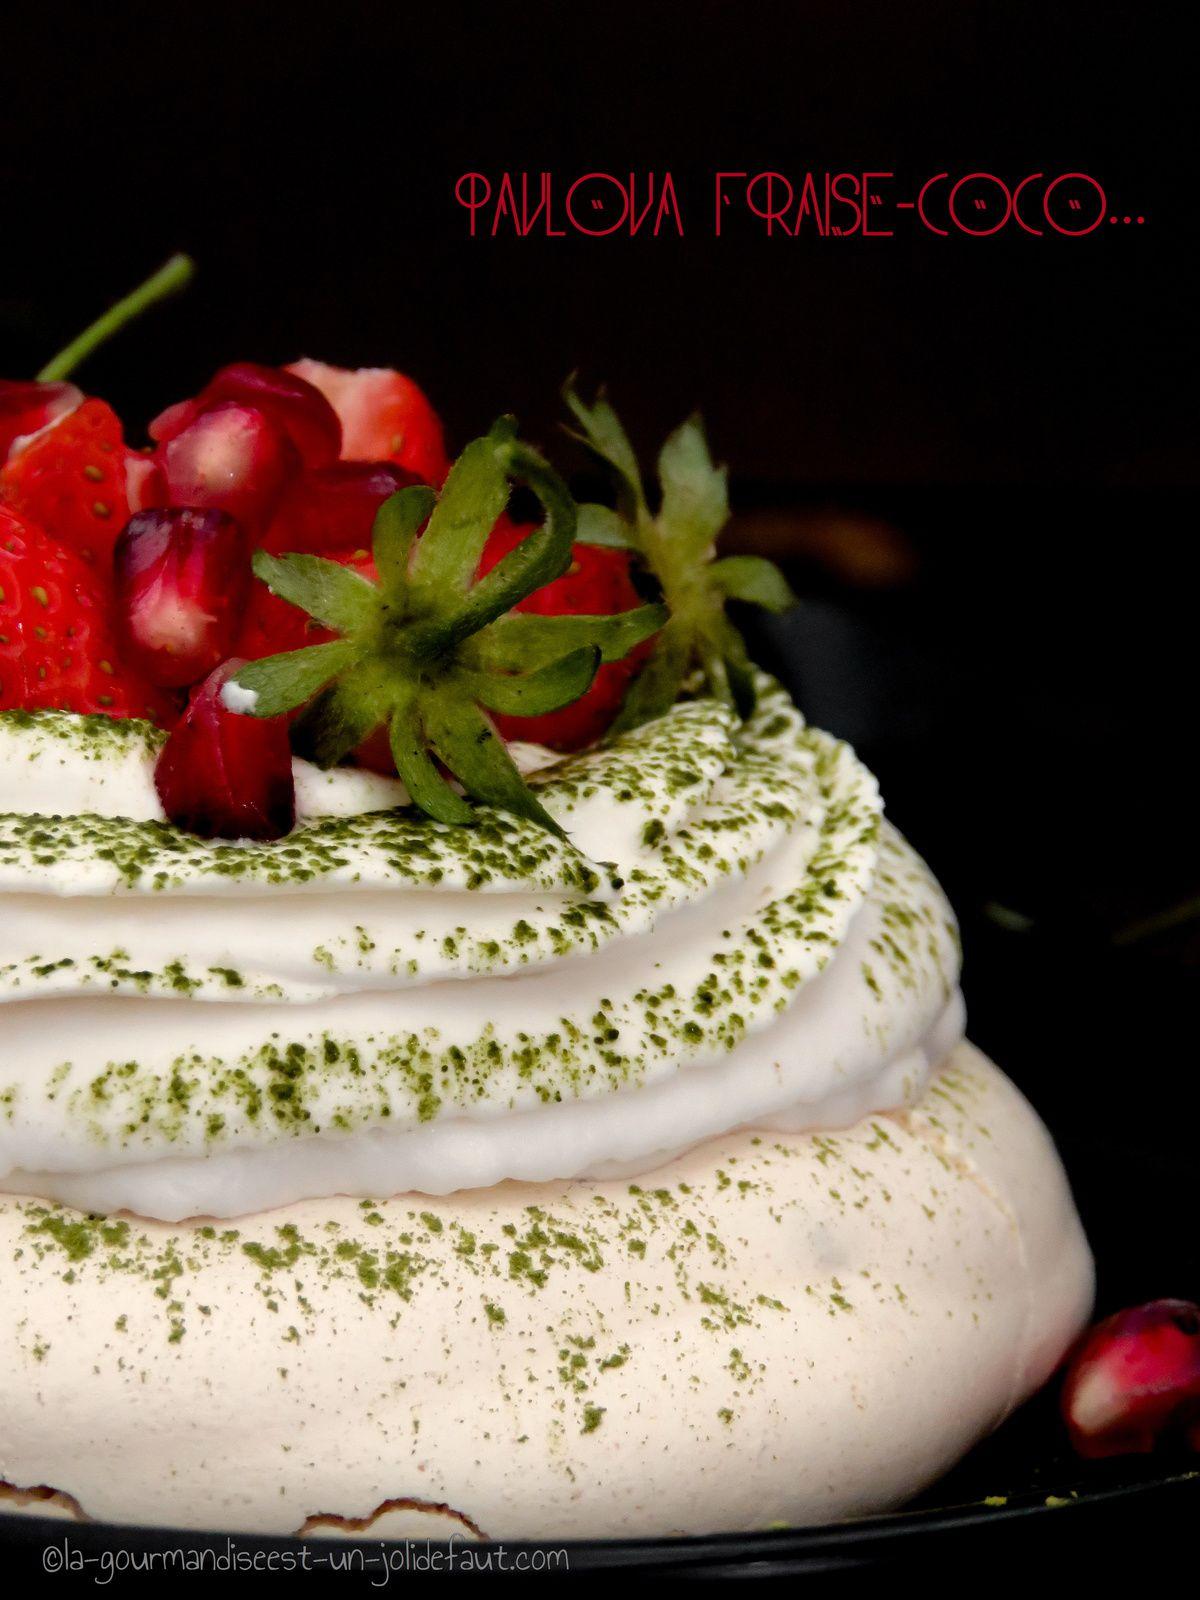 Pavlova fraise-coco